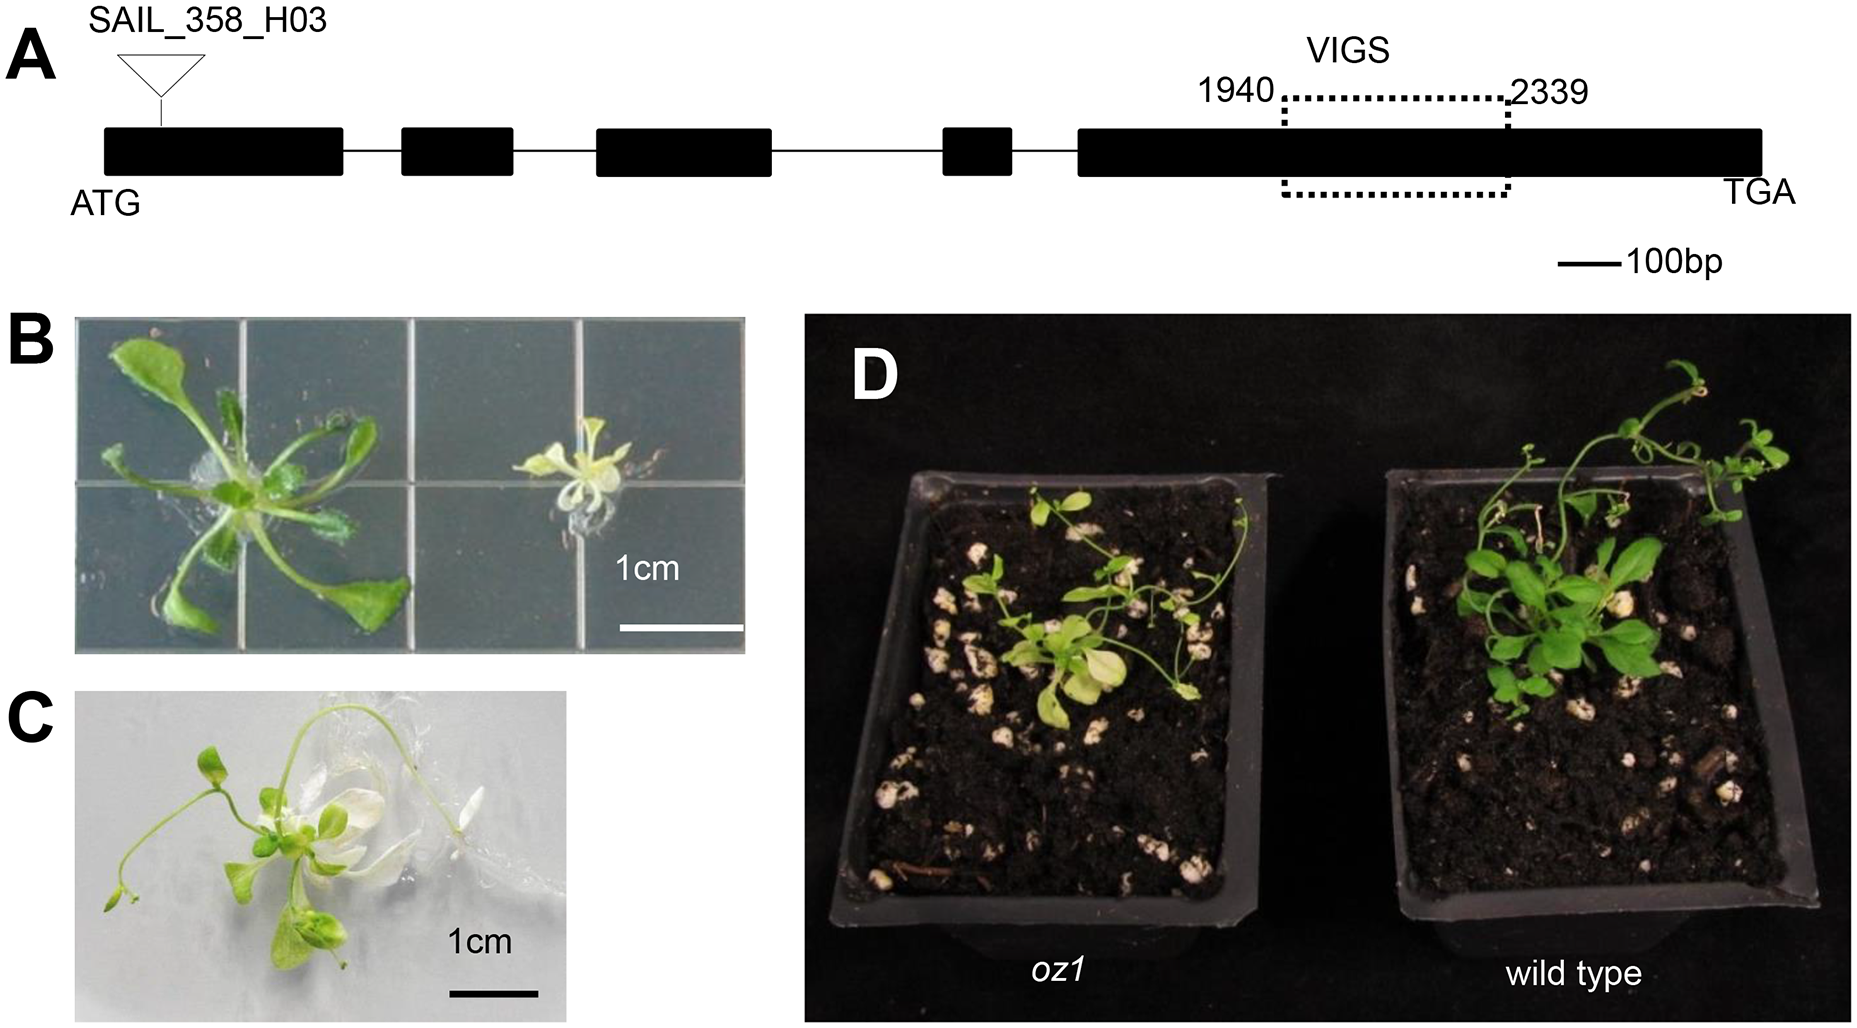 <i>OZ1</i> (At5g17790) gene structure and mutant phenotype.